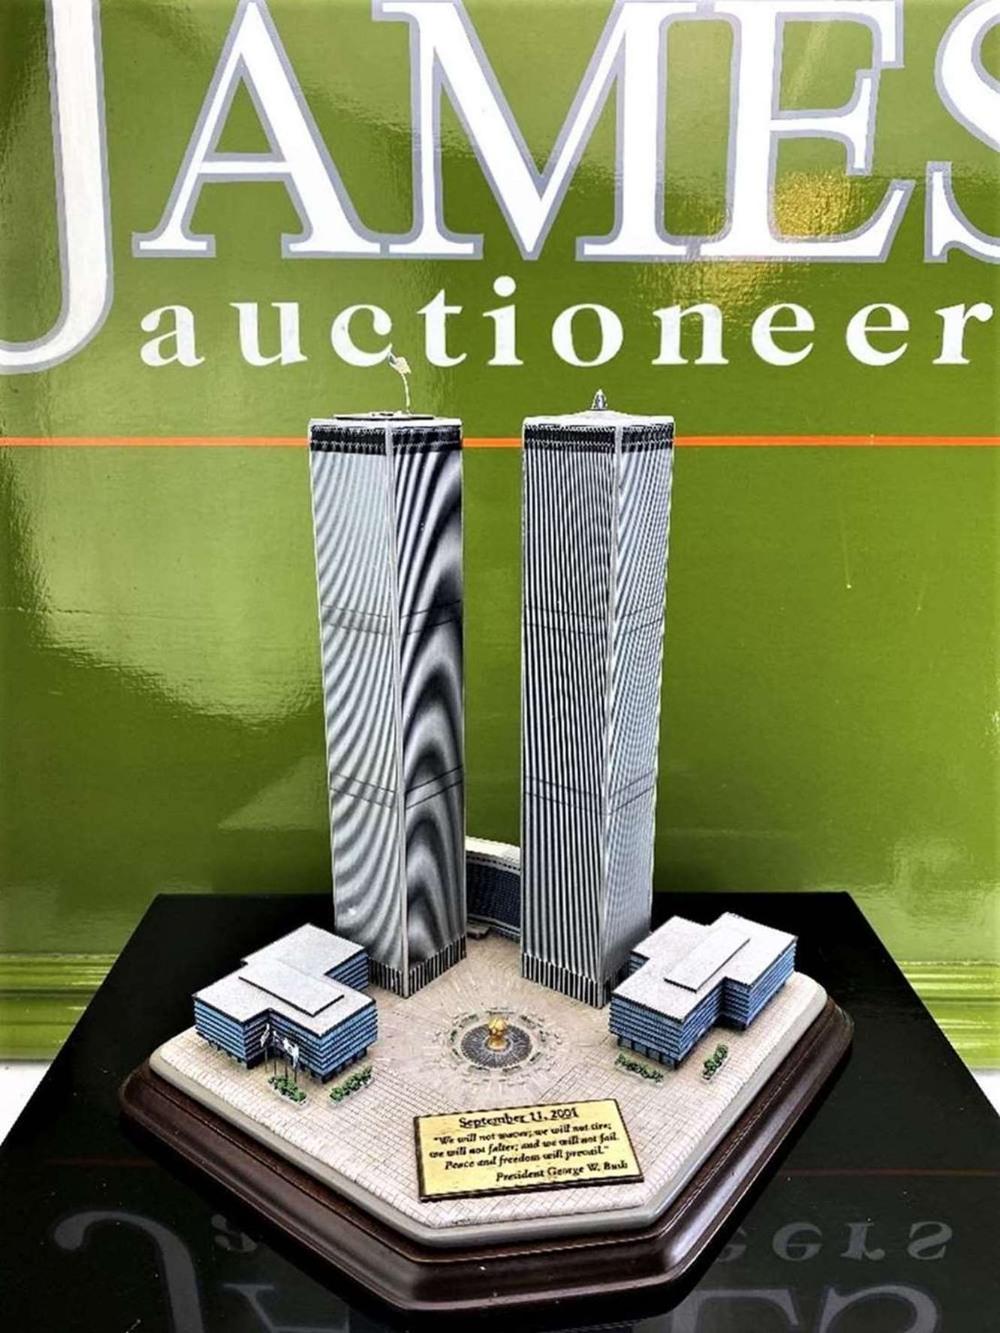 Danbury Mint September 11, 2001 9/11: Twin Towers Historic Desk Top Diarama - Image 6 of 6